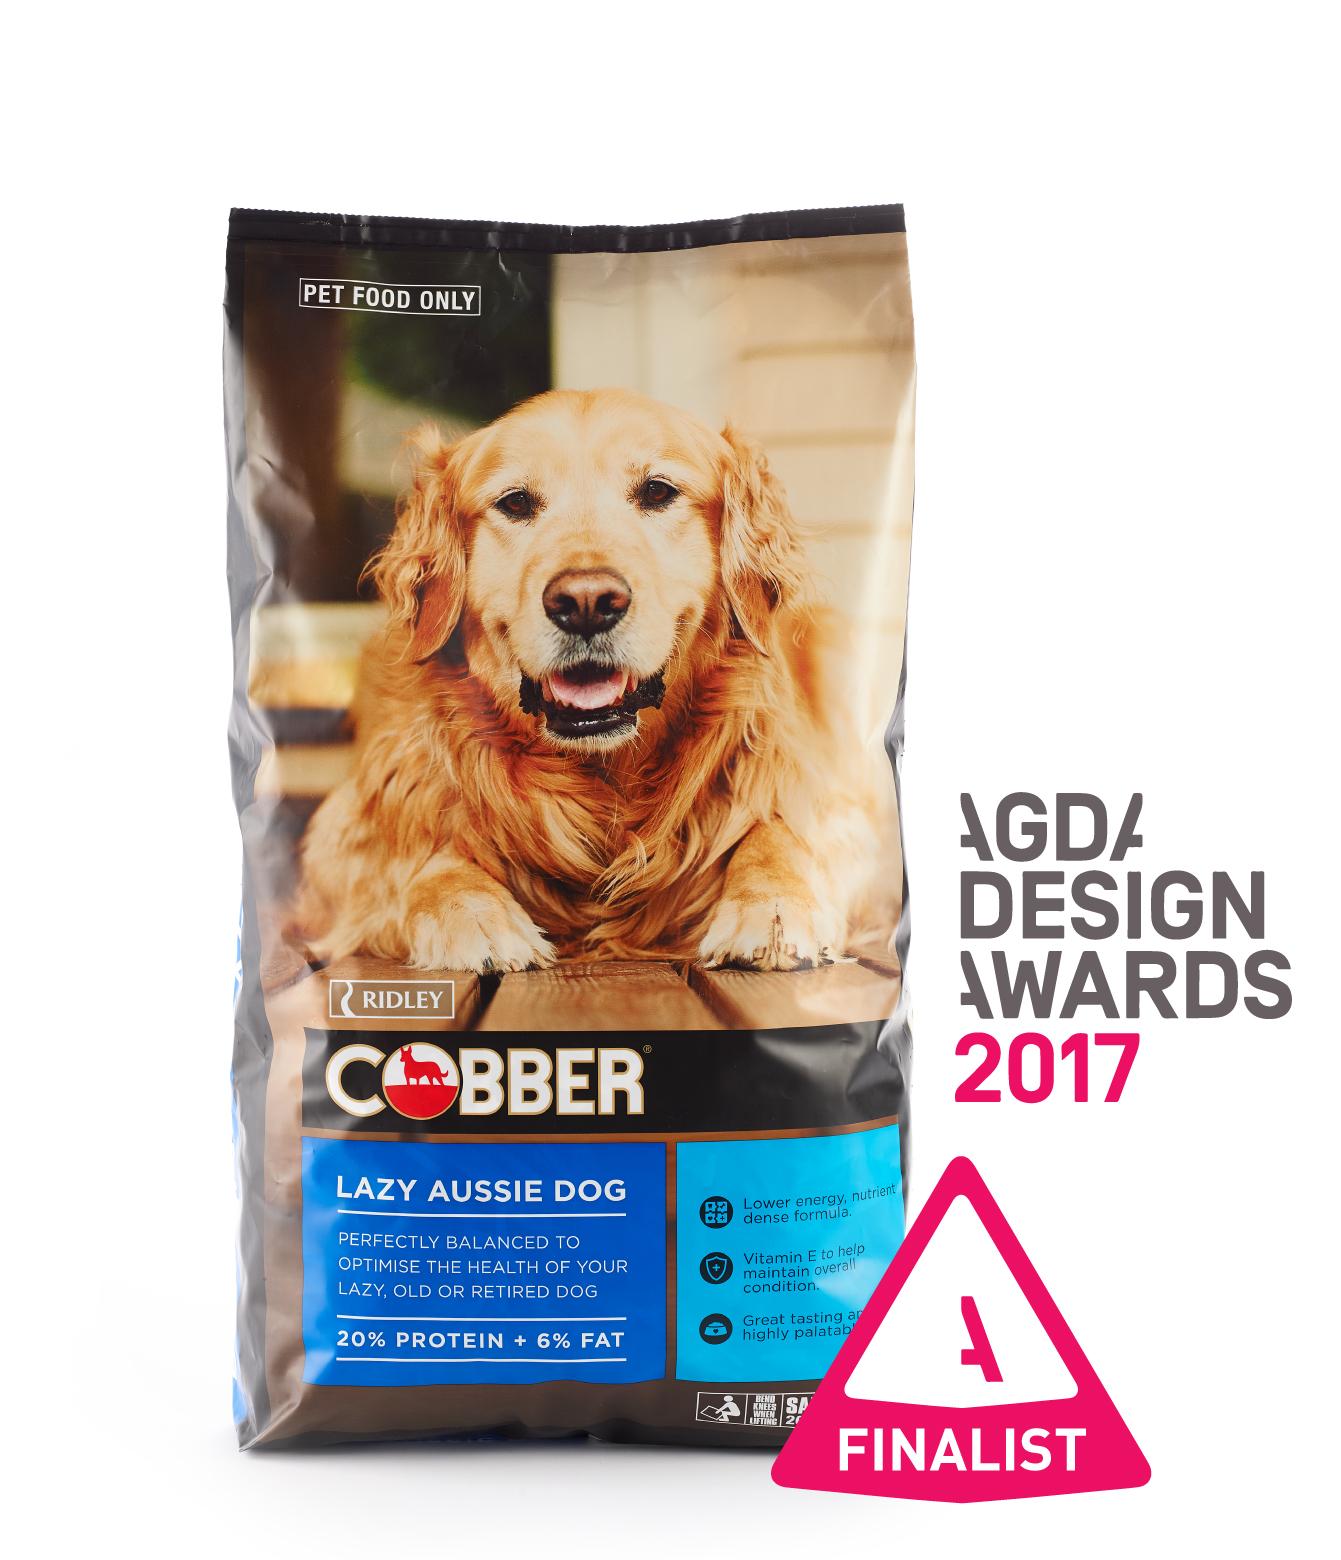 Cobber Packaging Design